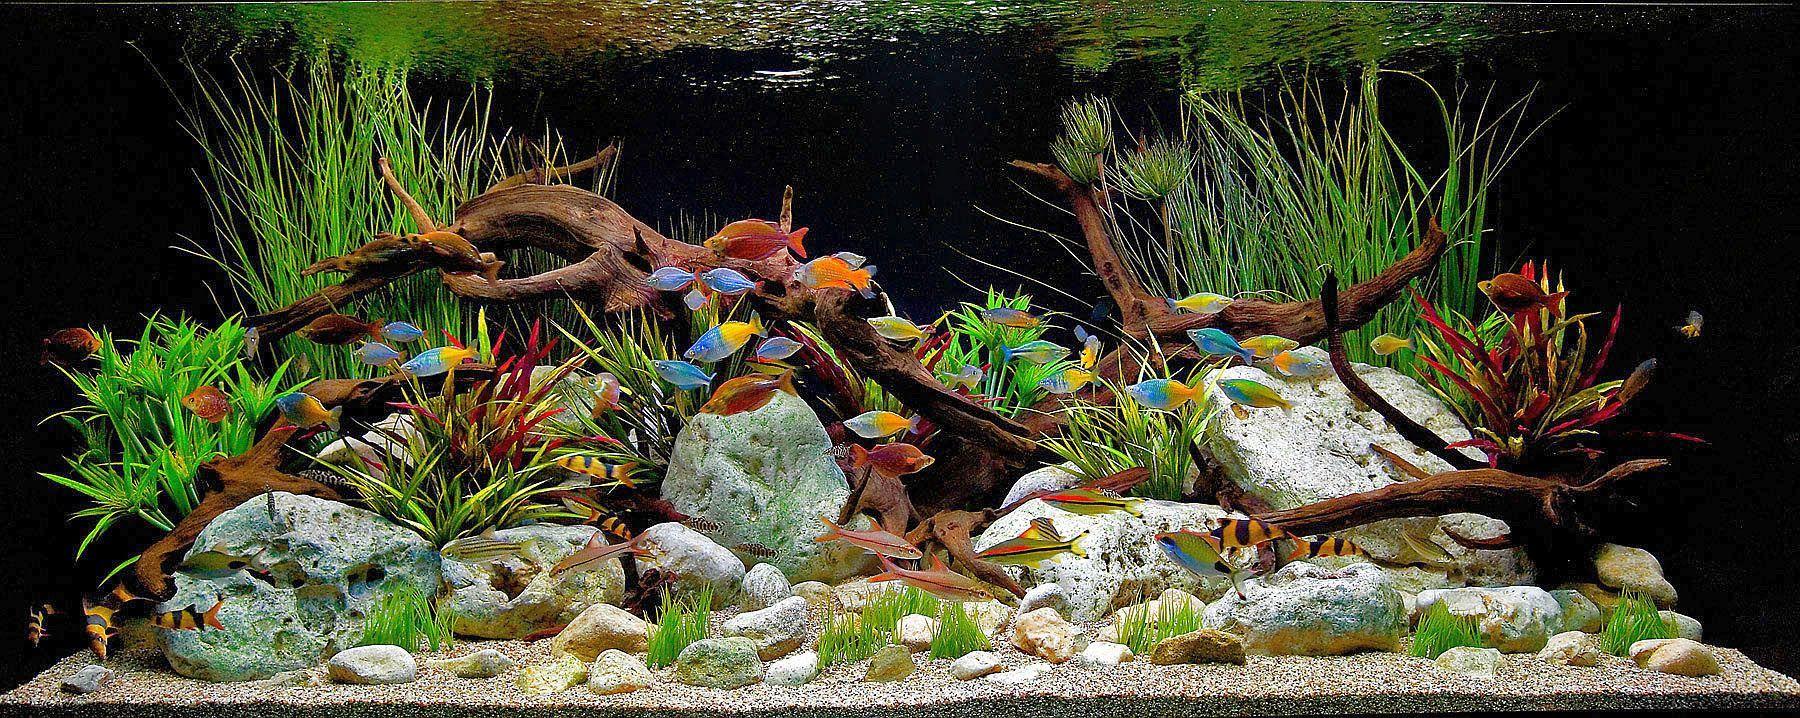 Cool Freshwater Aquarium Community Fish Tropical Aquarium Freshwater Aquarium Aquarium Design